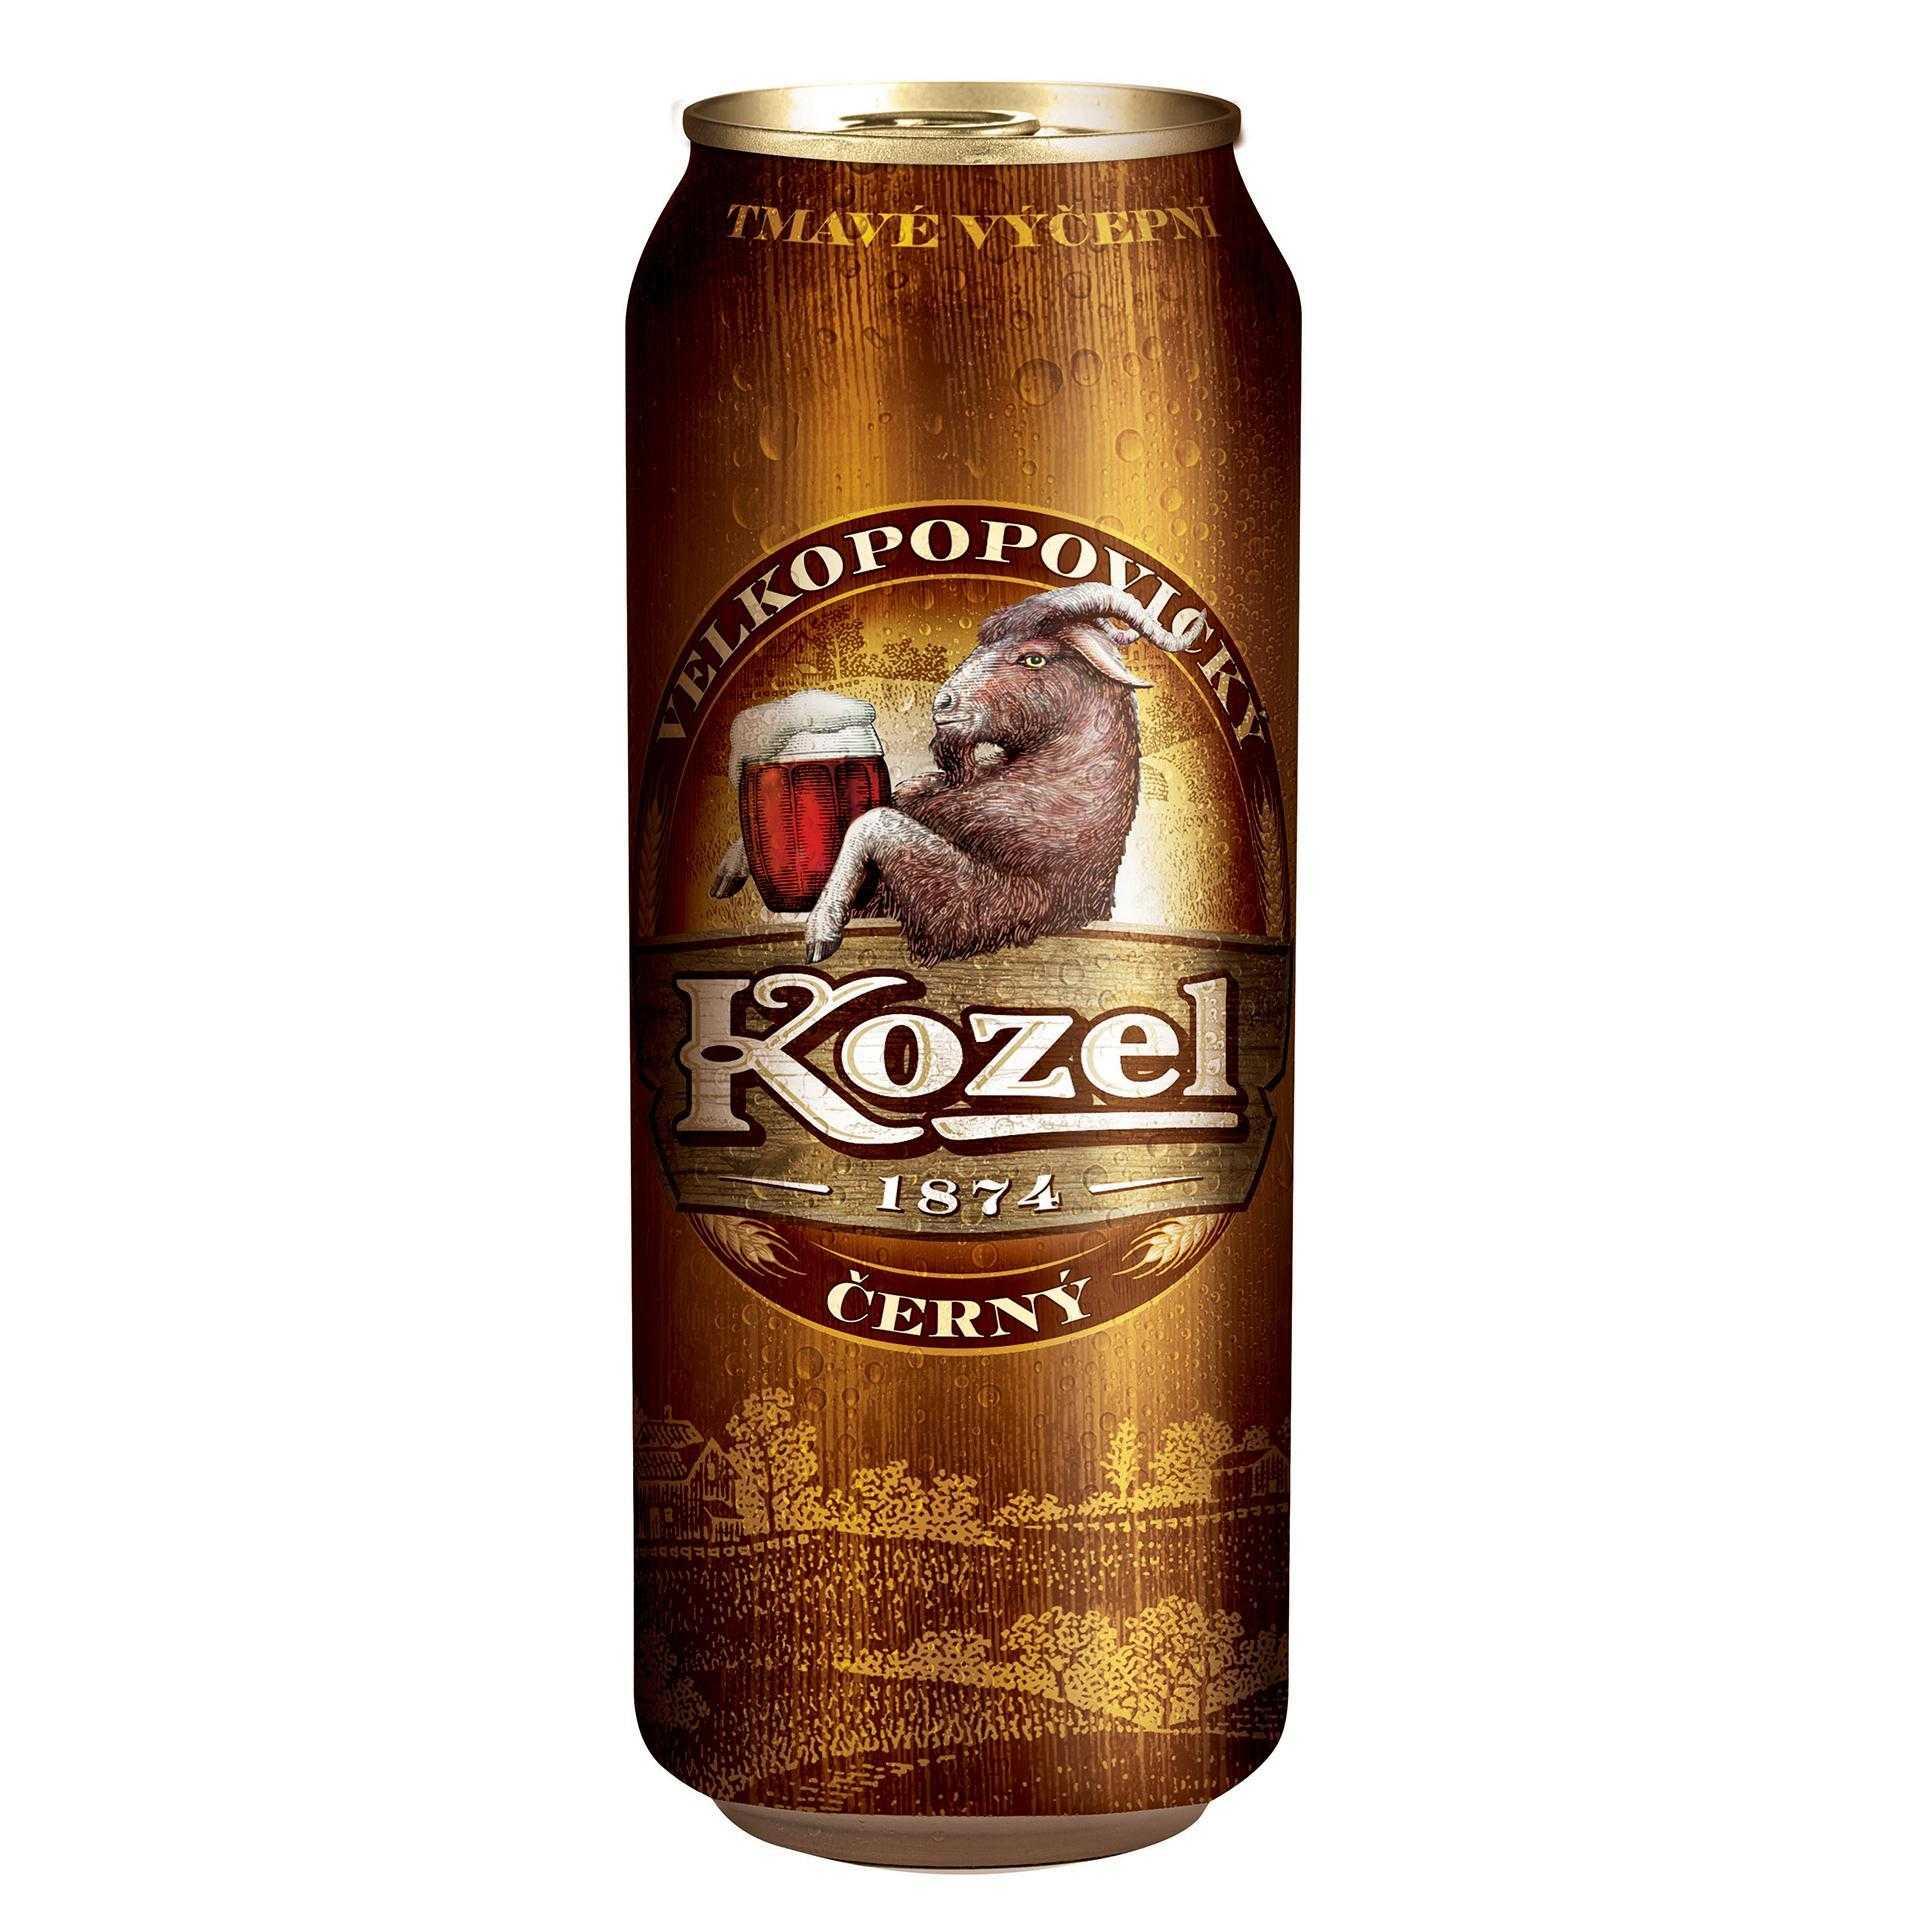 Kozel_Premium_Lager_0,5l_limenka_can_Adria_Supply_Bolt_kupipovoljno